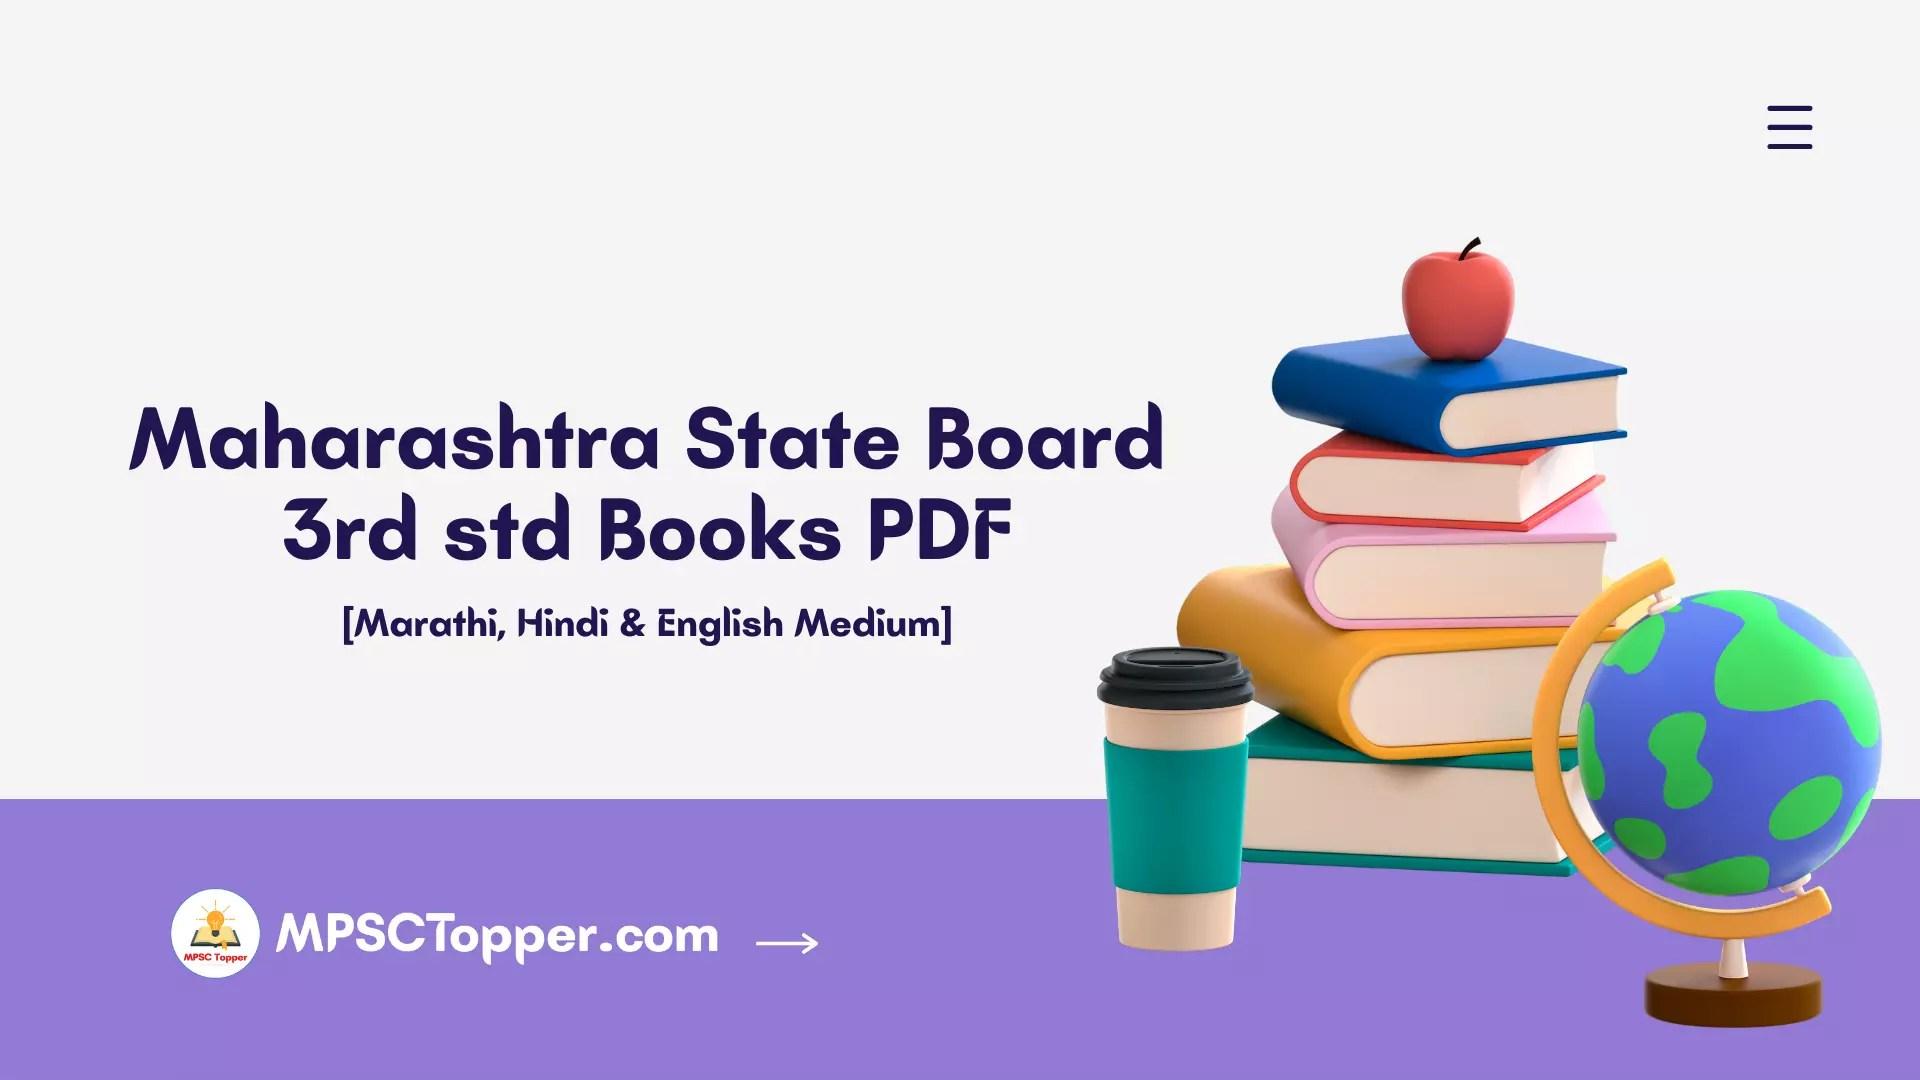 3rd std Books PDF